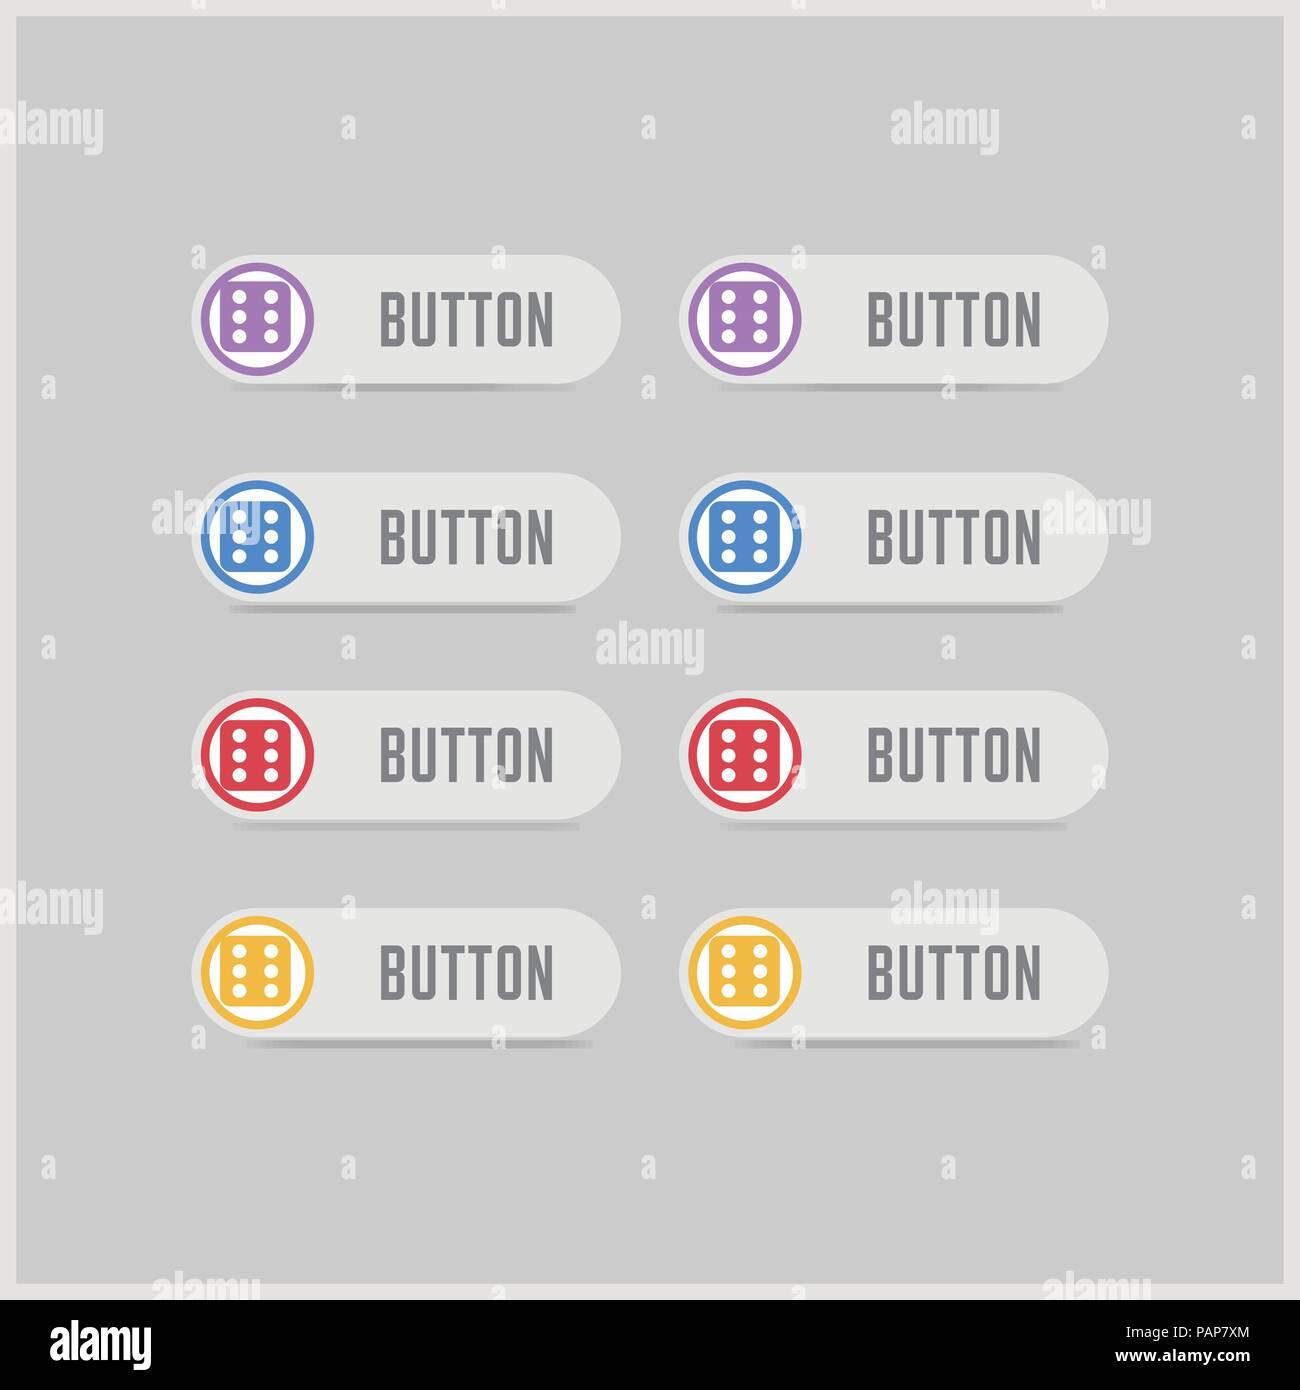 Dice Cube Icon - Free vector icon Stock Vector Art